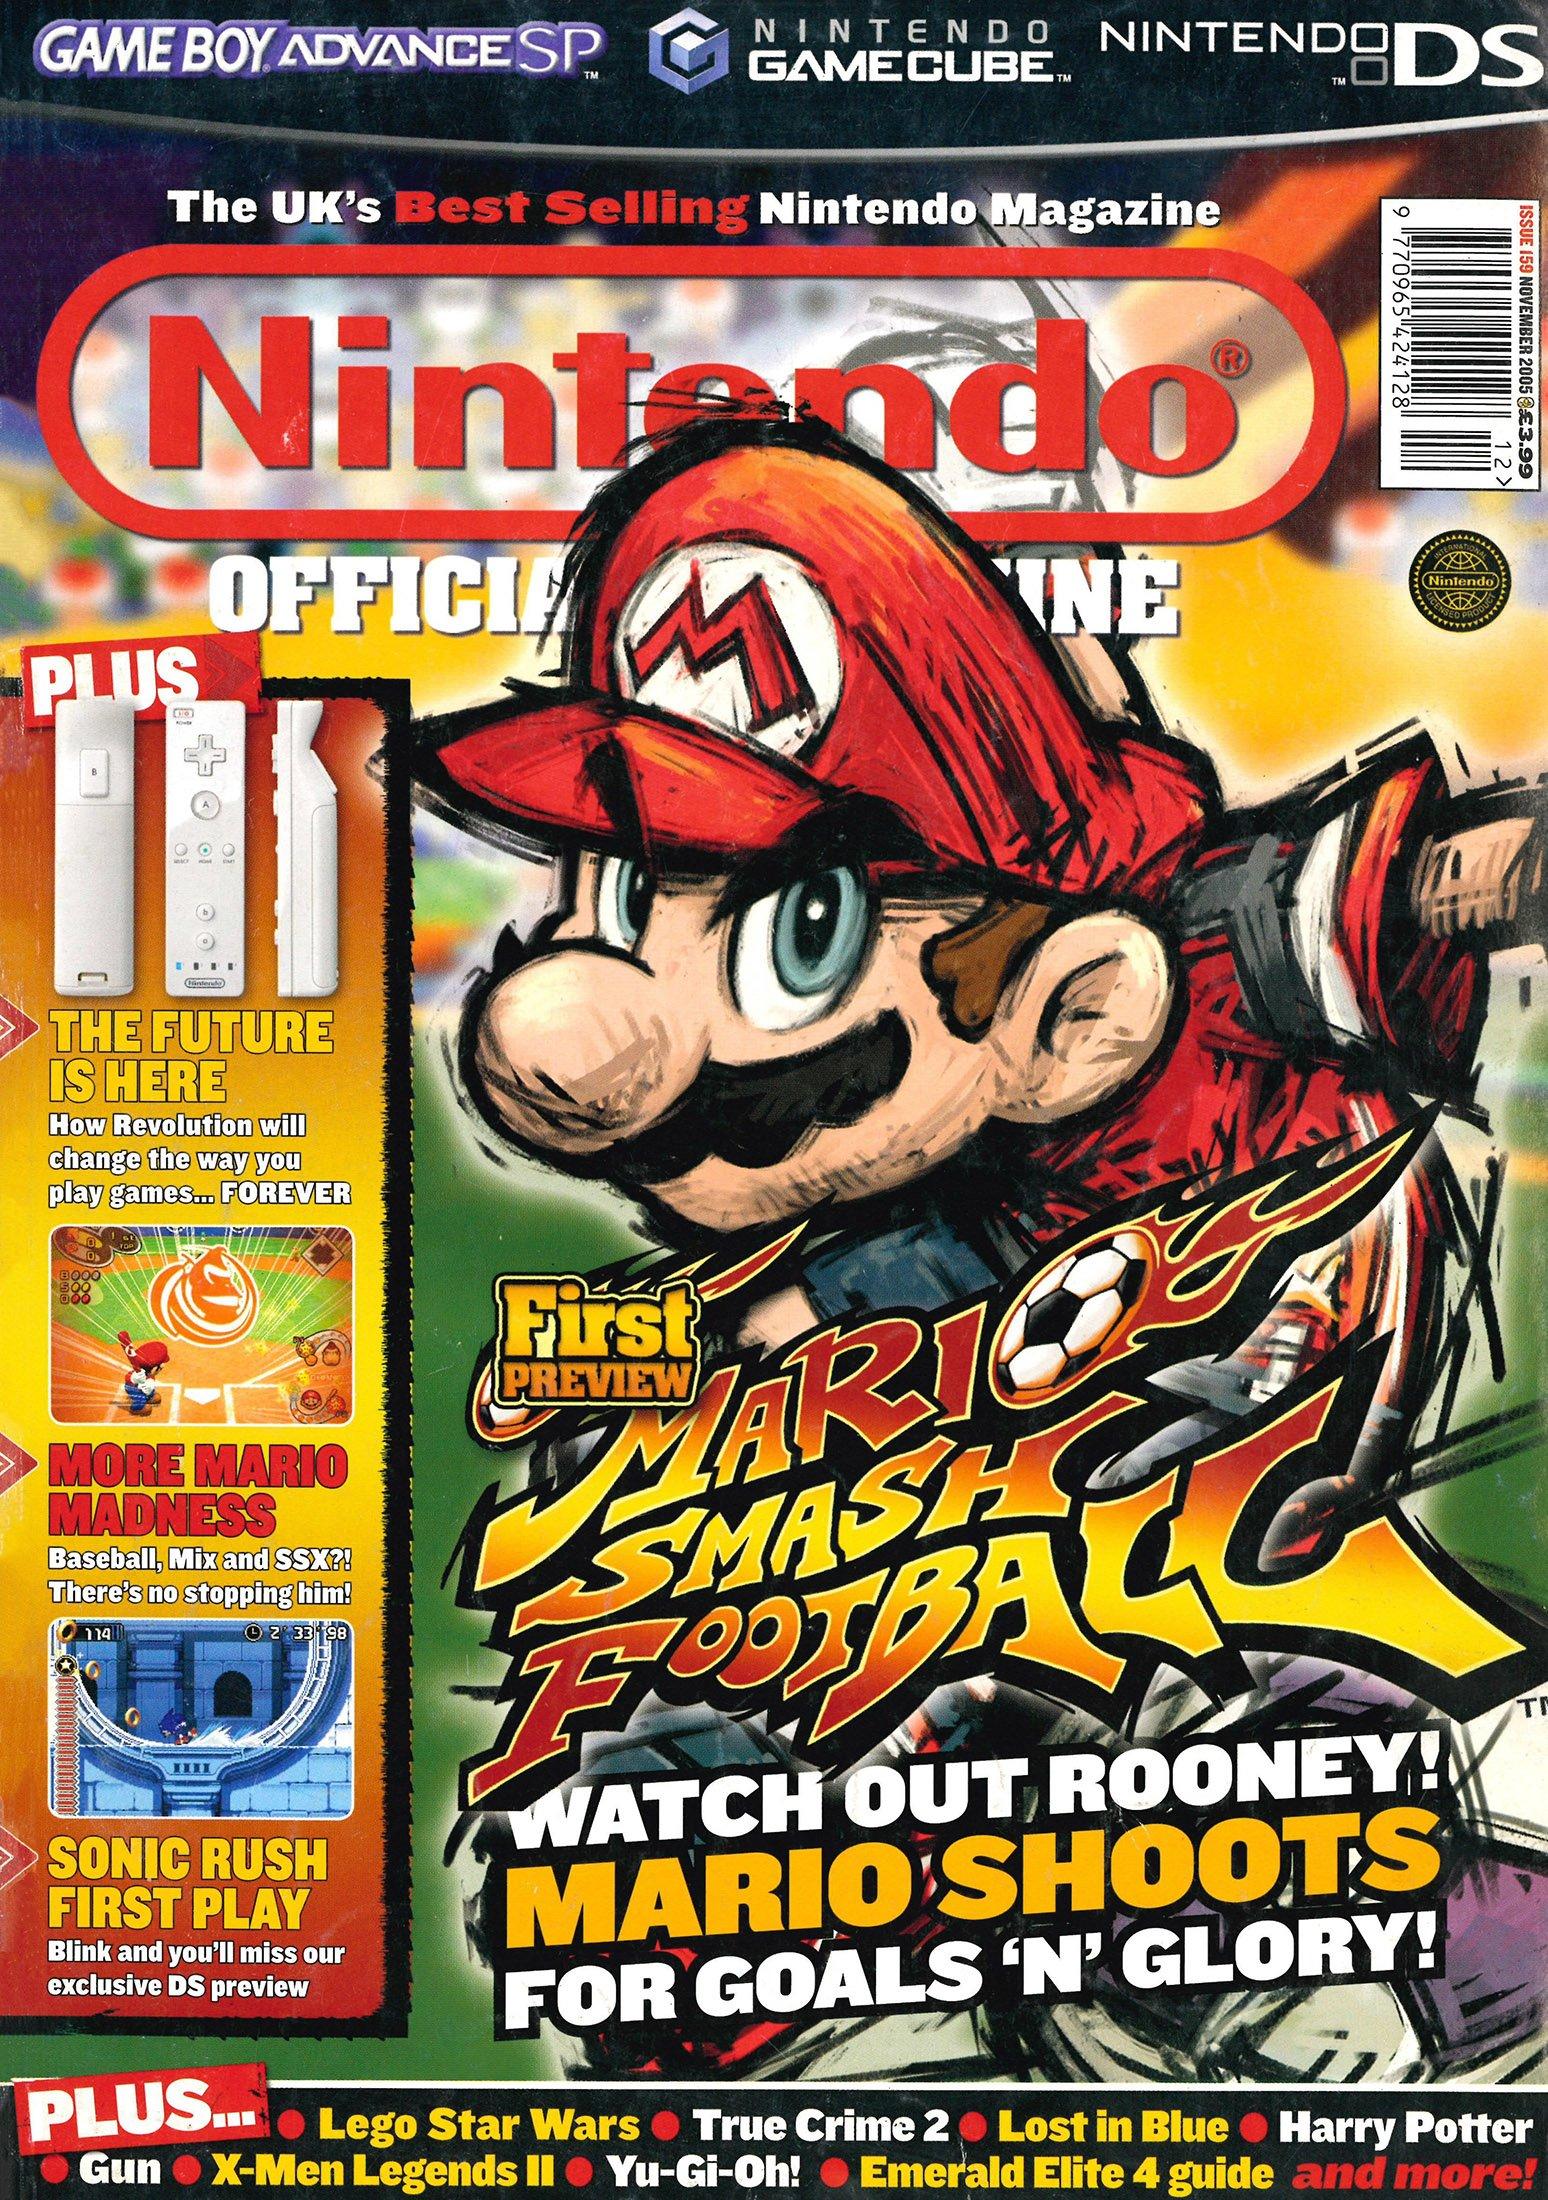 Nintendo Official Magazine 159 (November 2005)